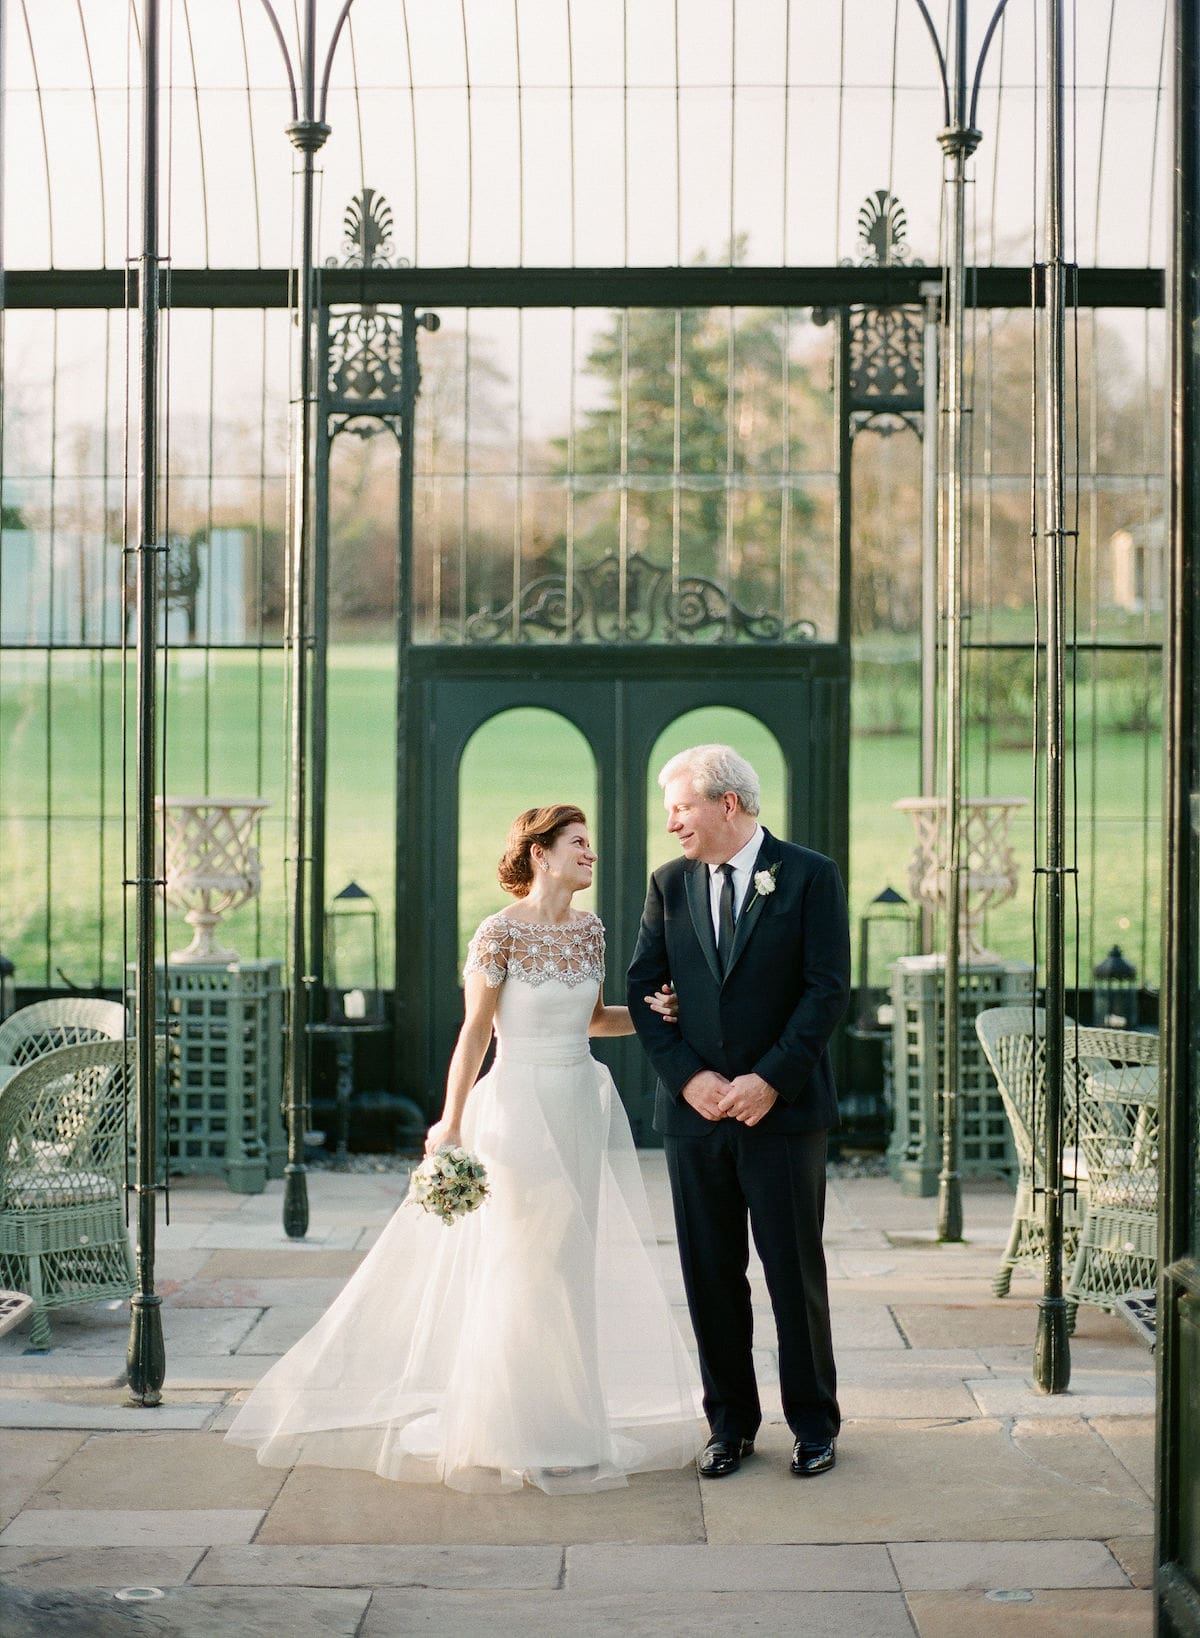 Ballyfin couple in conservatory